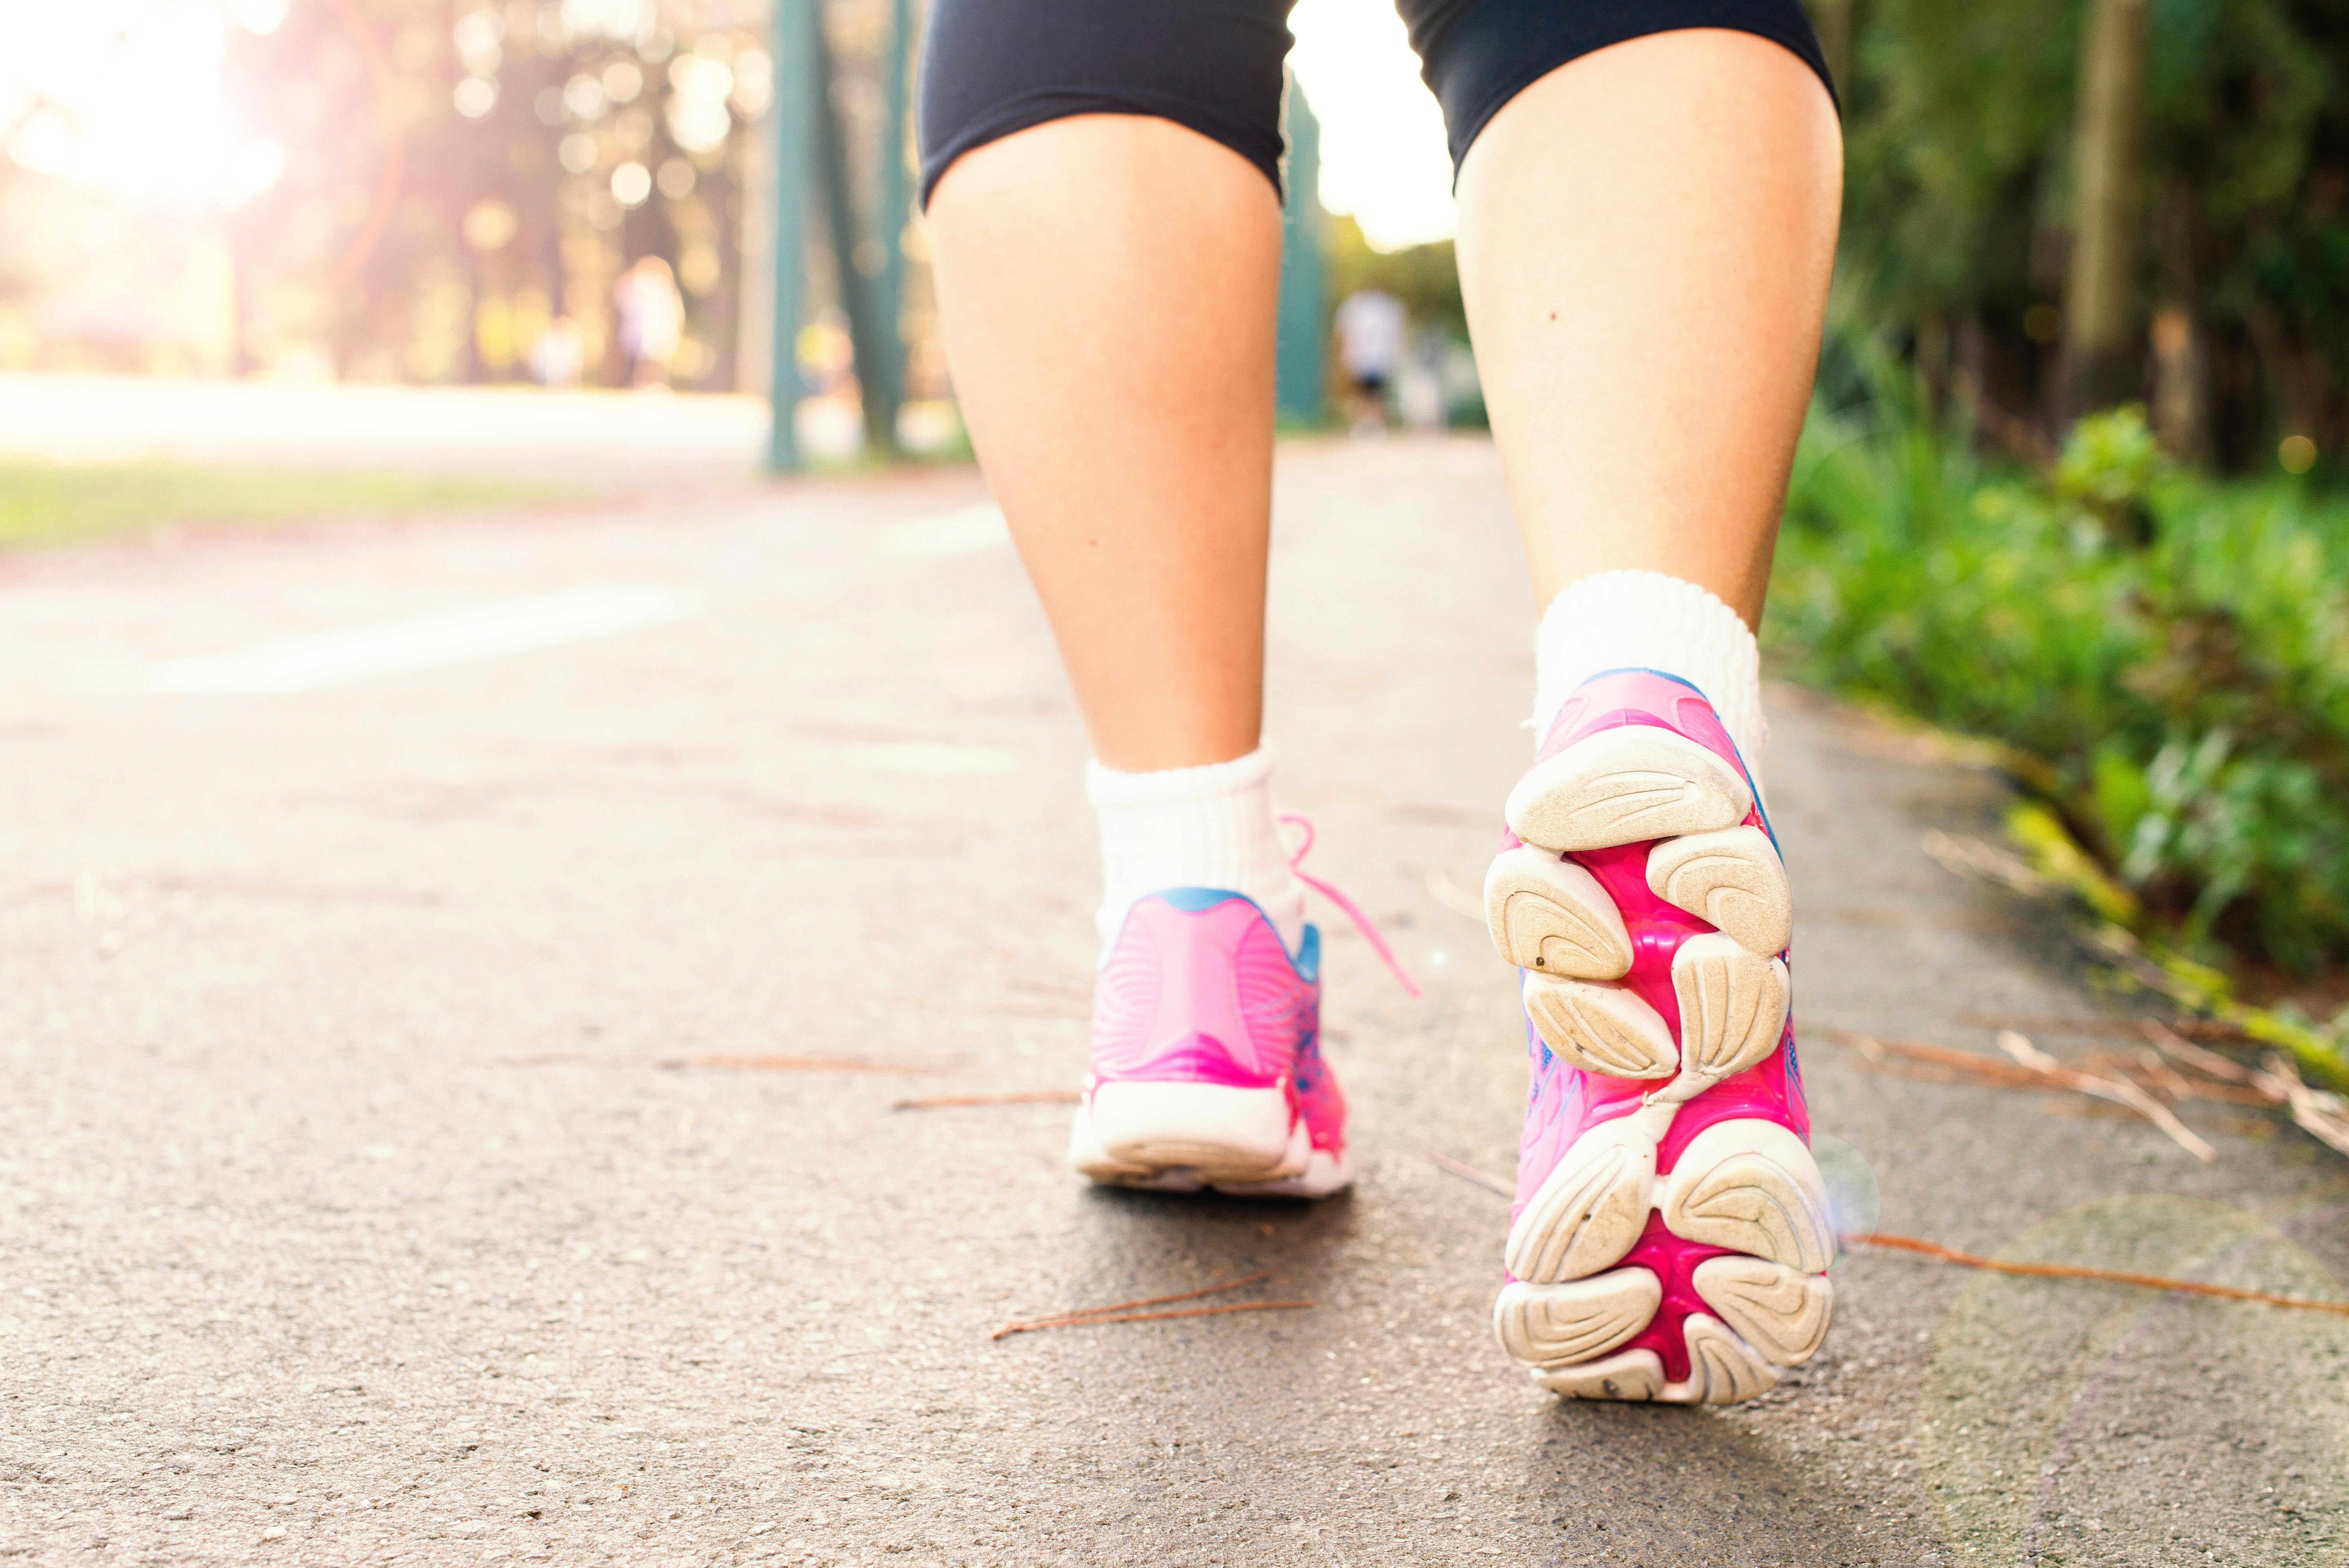 activity-fitness-footwear-1556710